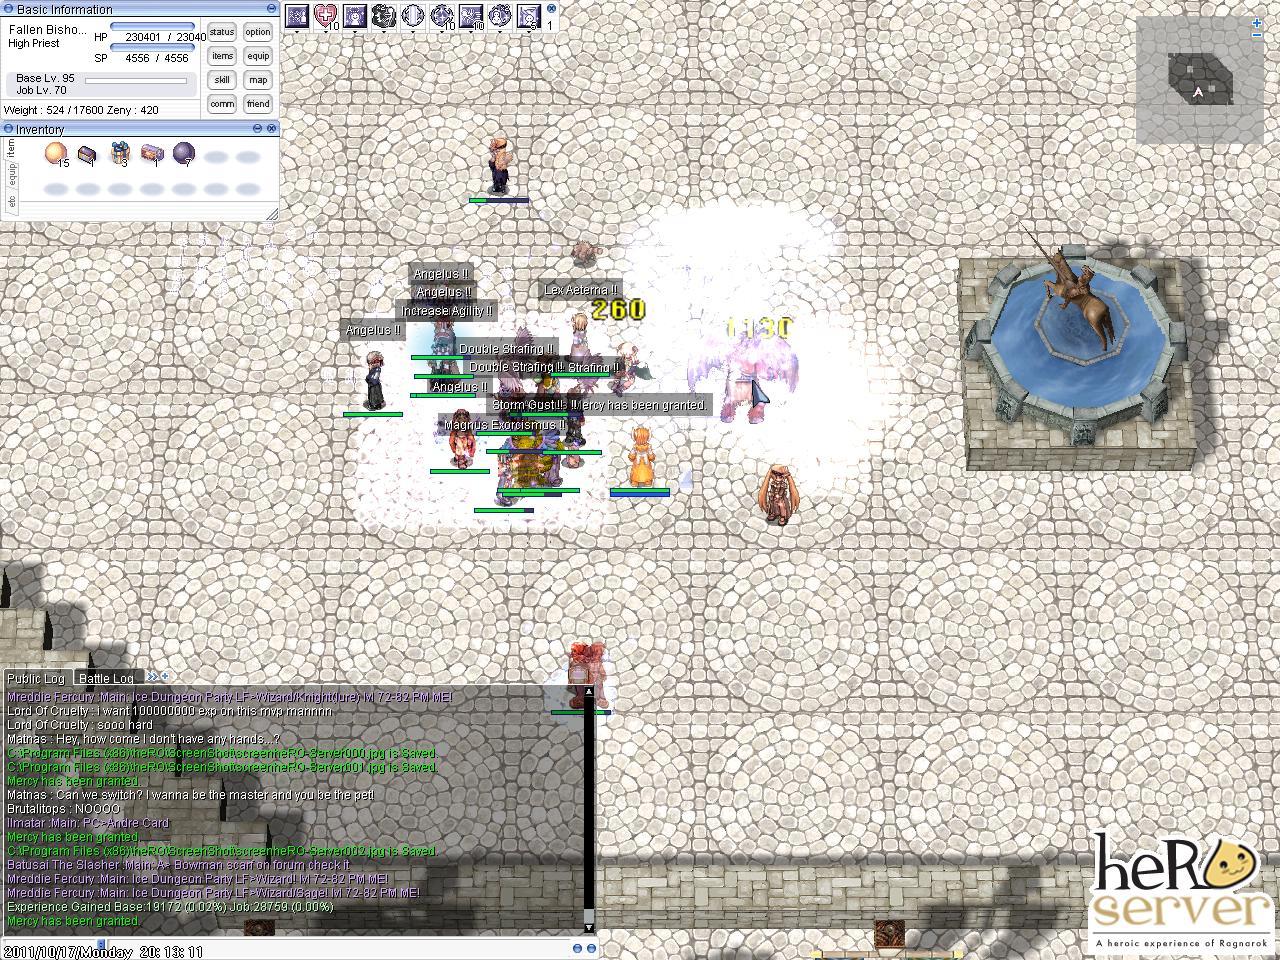 [Image: screenheRO-Server003.jpg]